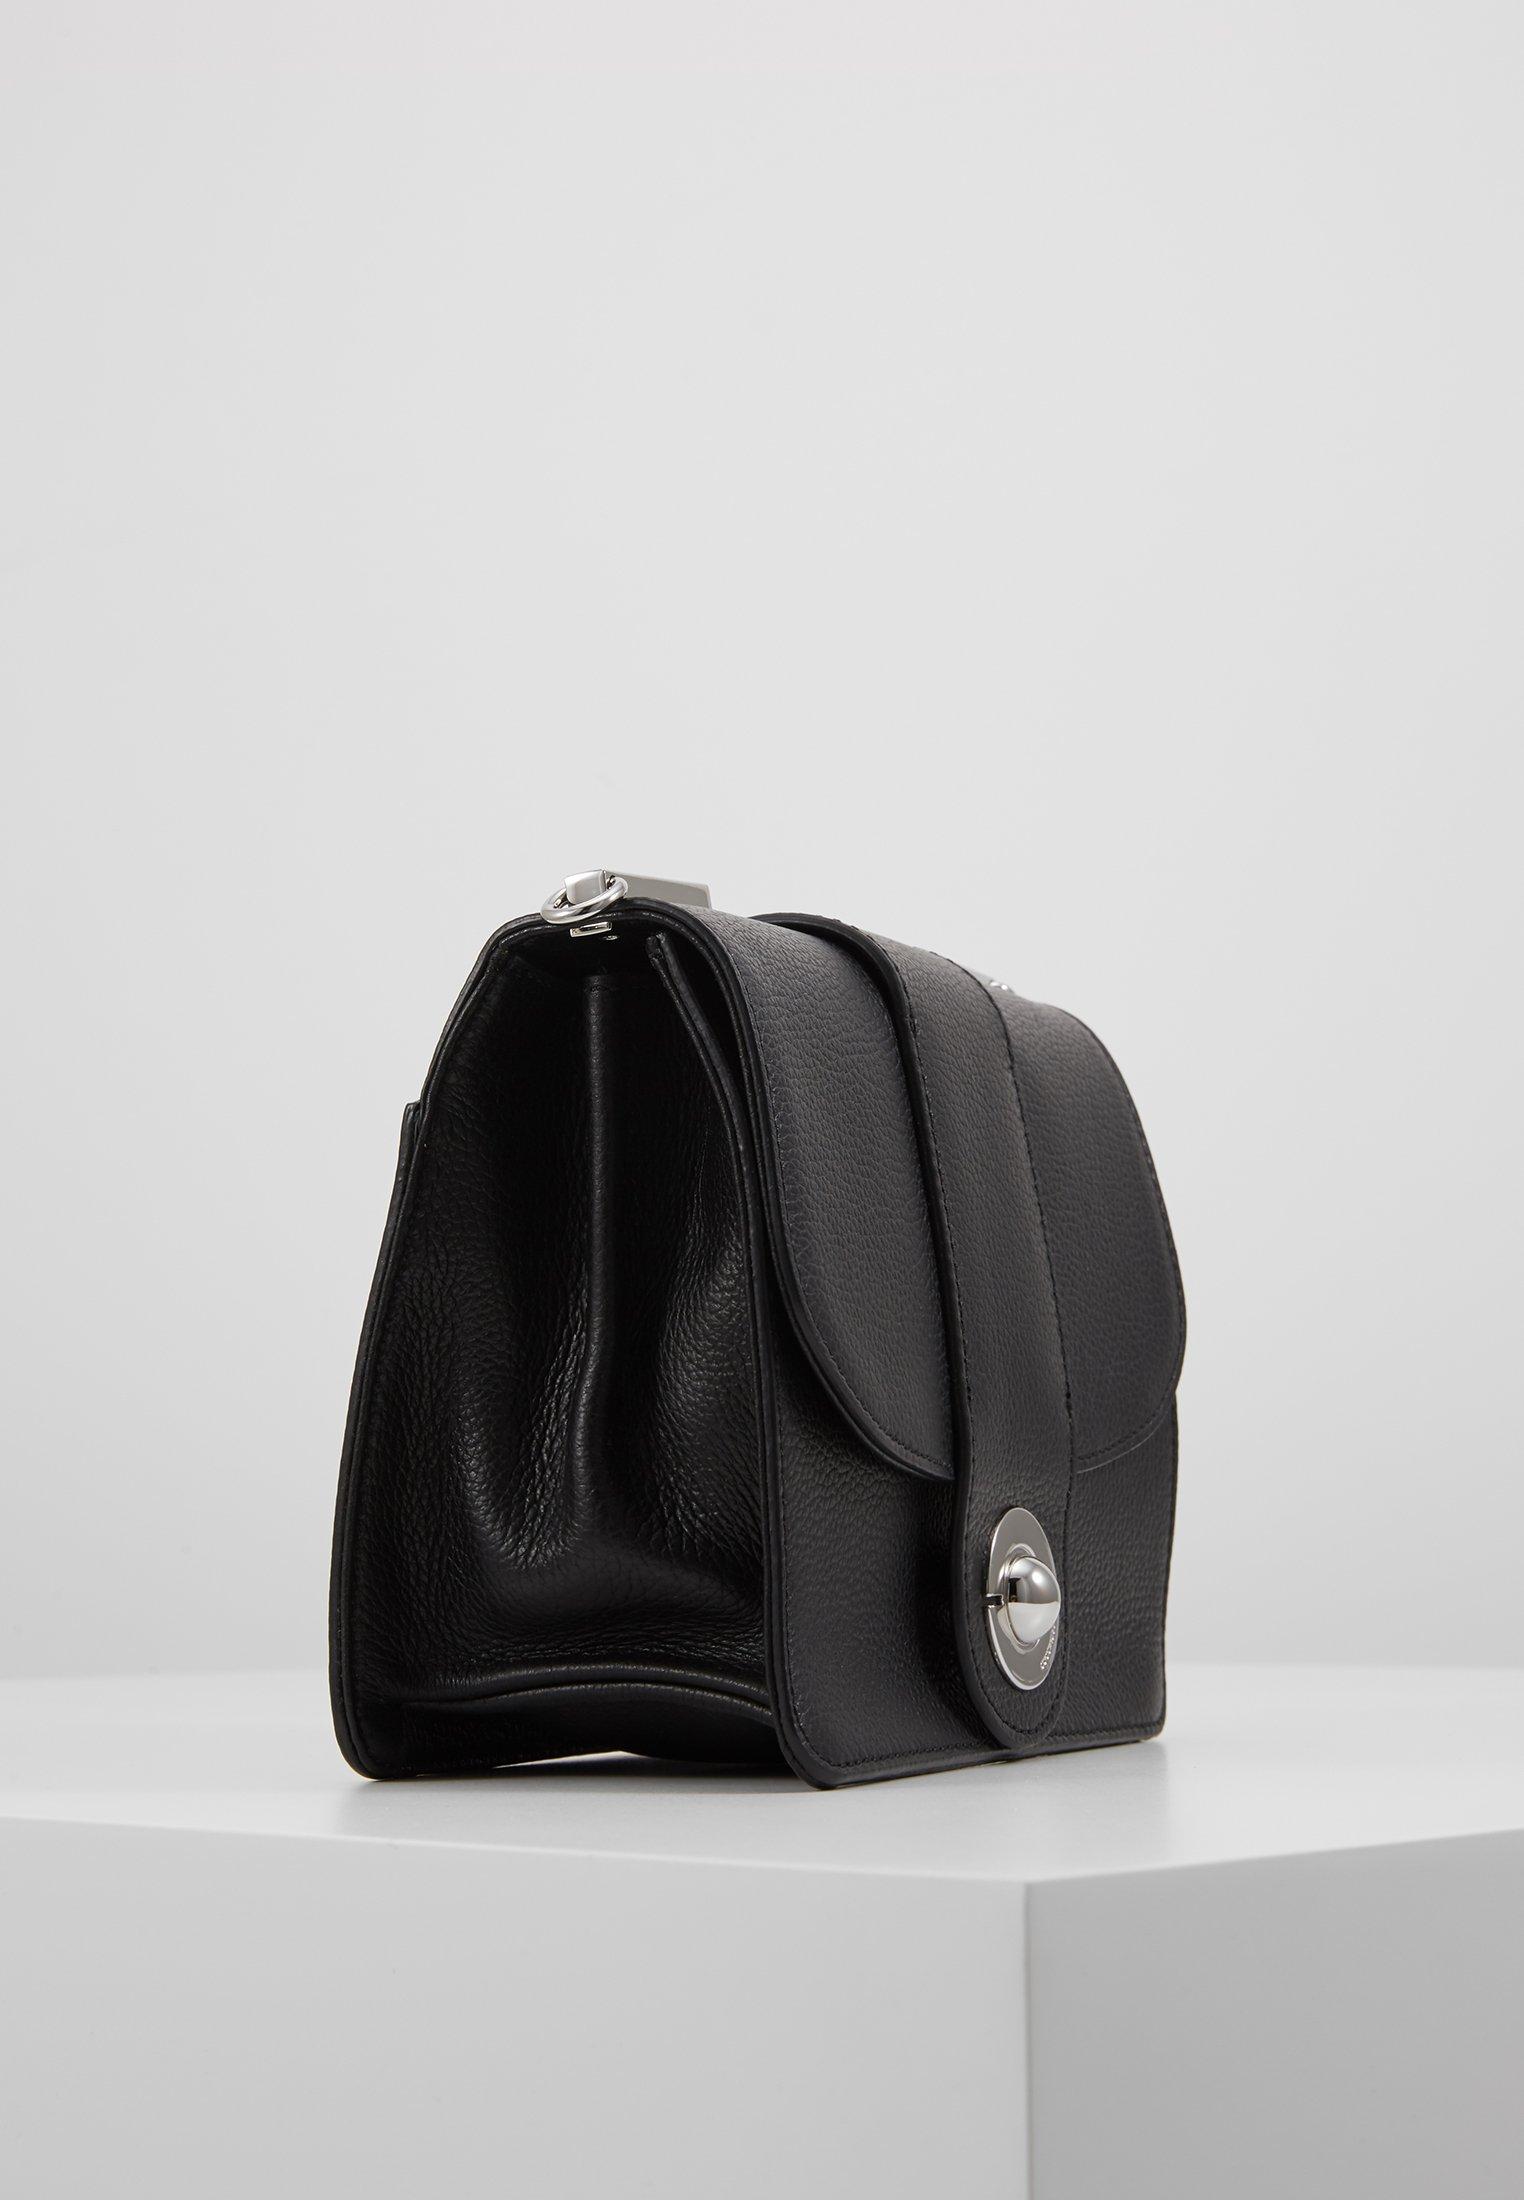 Clearance Outlet Coccinelle BORSA - Across body bag - noir | women's accessories 2020 M1Tay